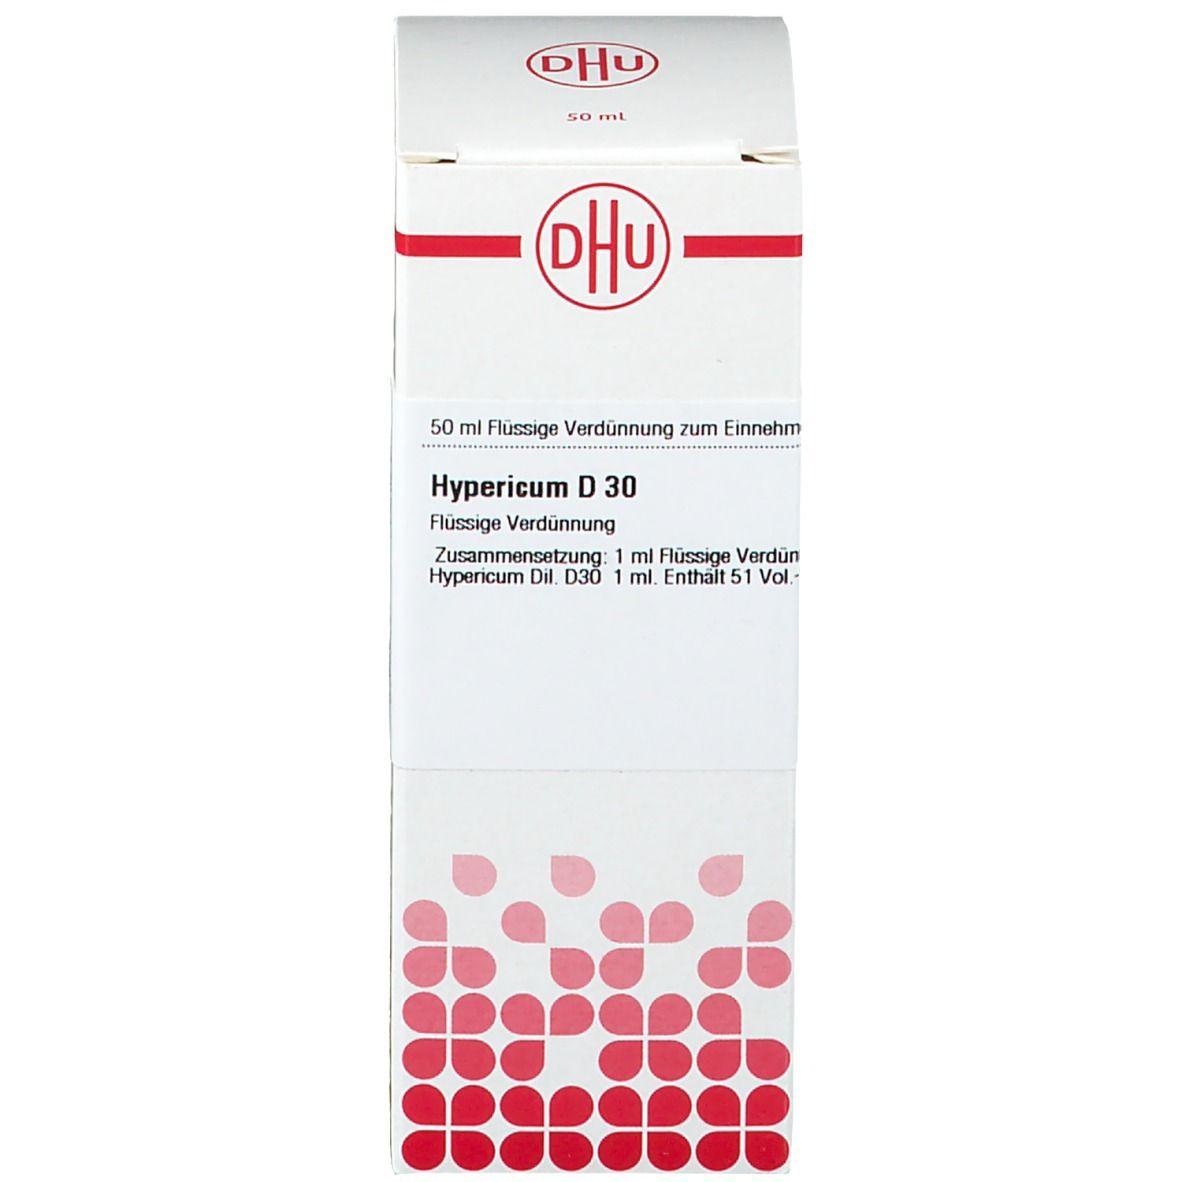 DHU Hypericum D30